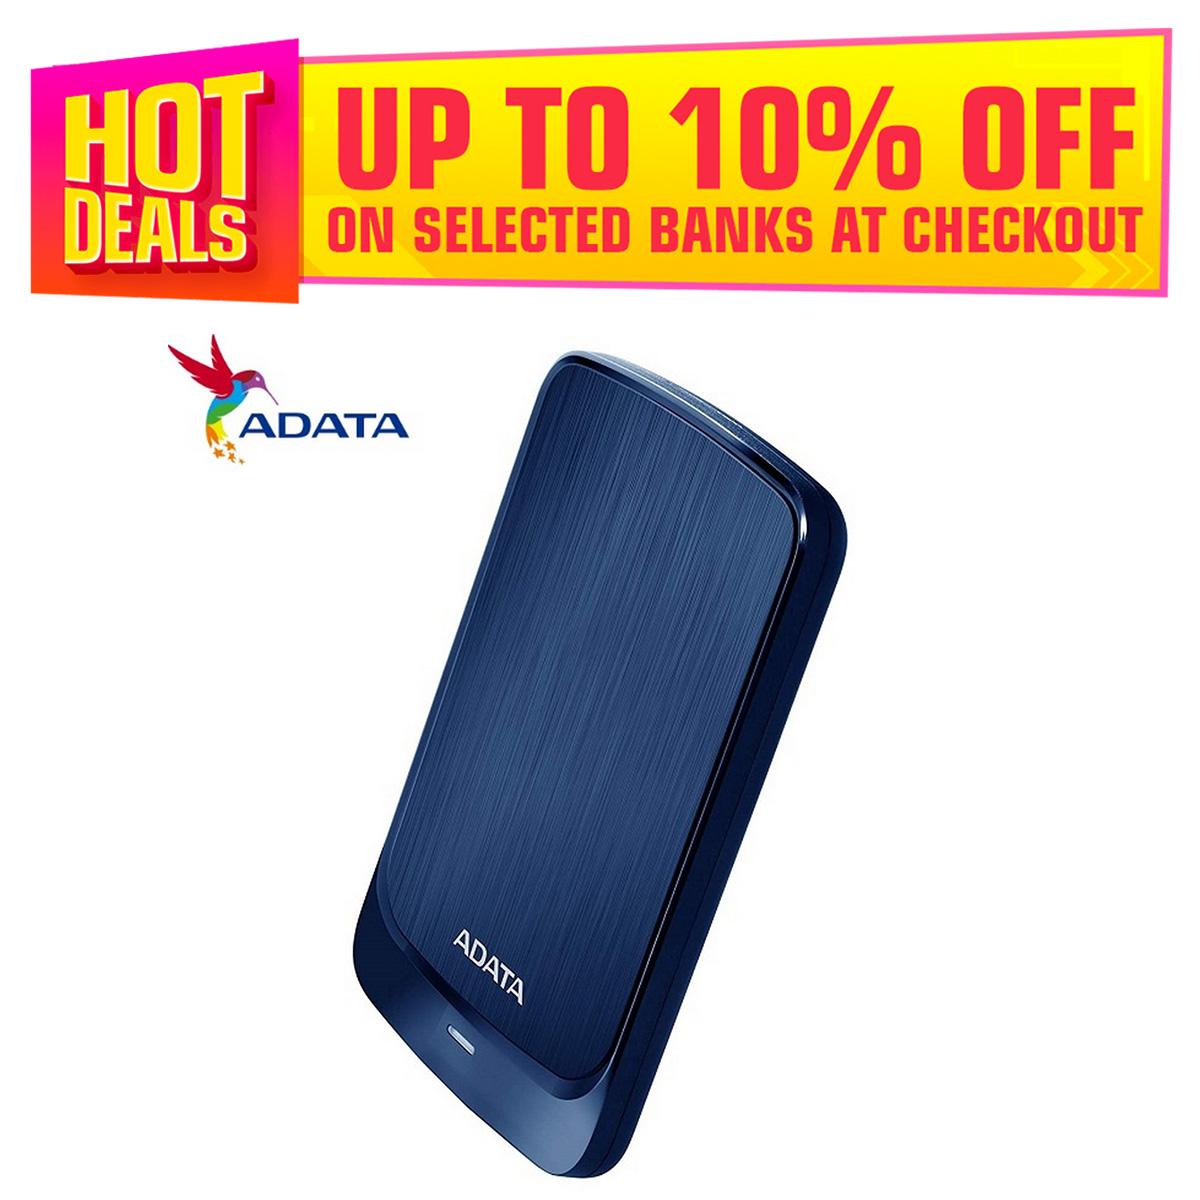 ADATA 1TB HV320 Slim Compact Portable USB 3.2 Gen 1 External Hard Drive - Blue